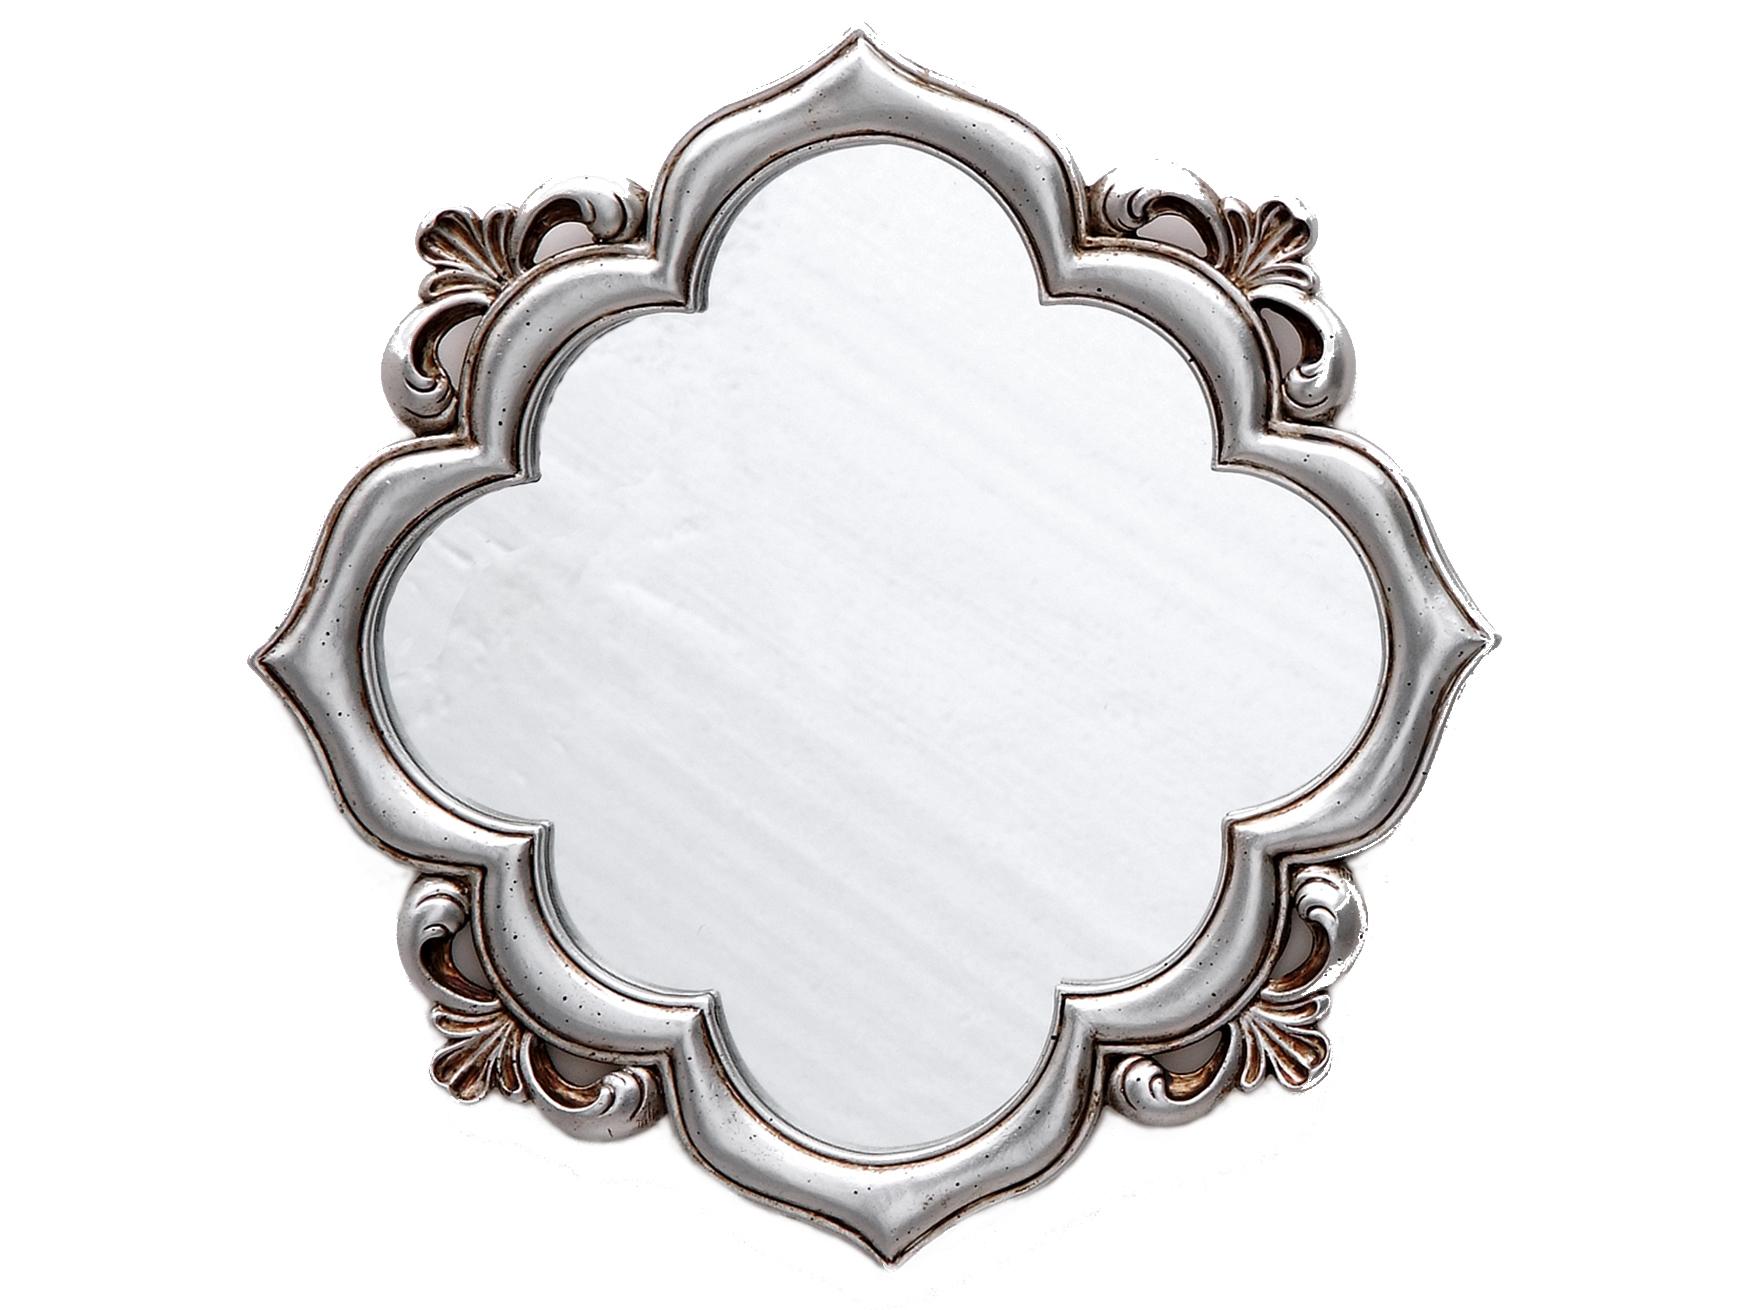 ЗеркалоНастенные зеркала<br><br><br>Material: Пластик<br>Ширина см: 29<br>Высота см: 29<br>Глубина см: 4